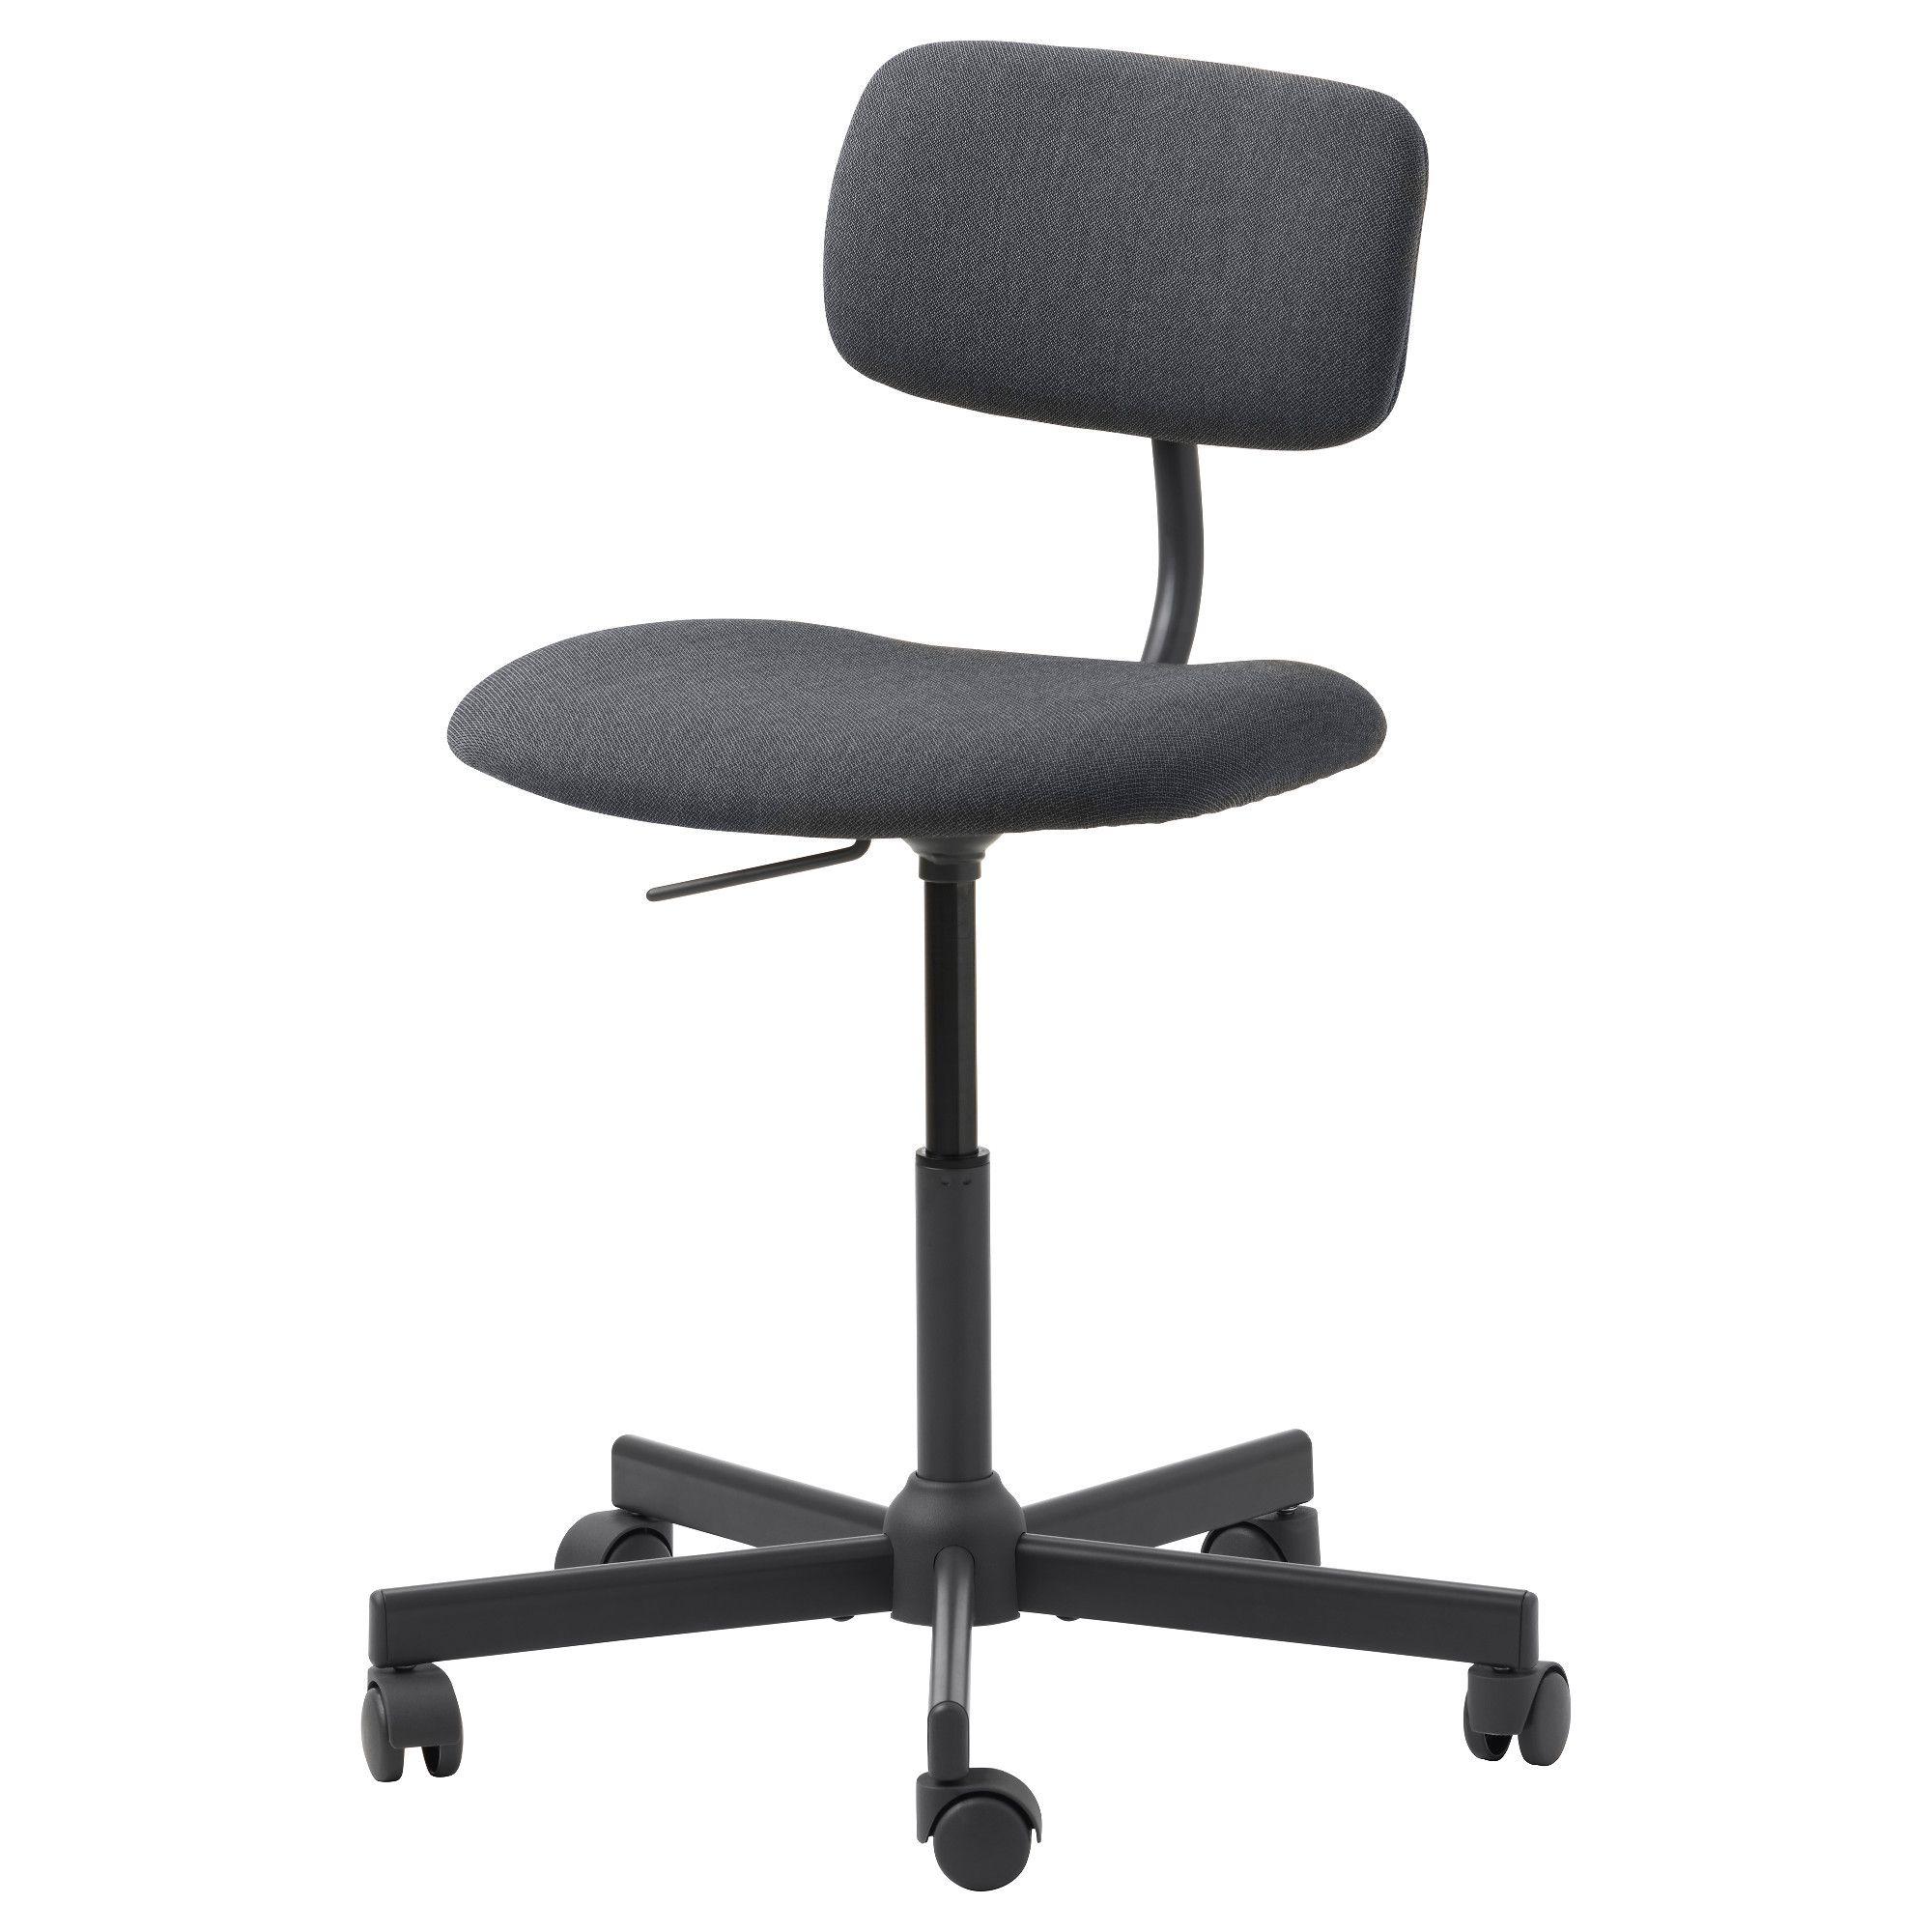 Bleckberget swivel chair idekulla beige small chair